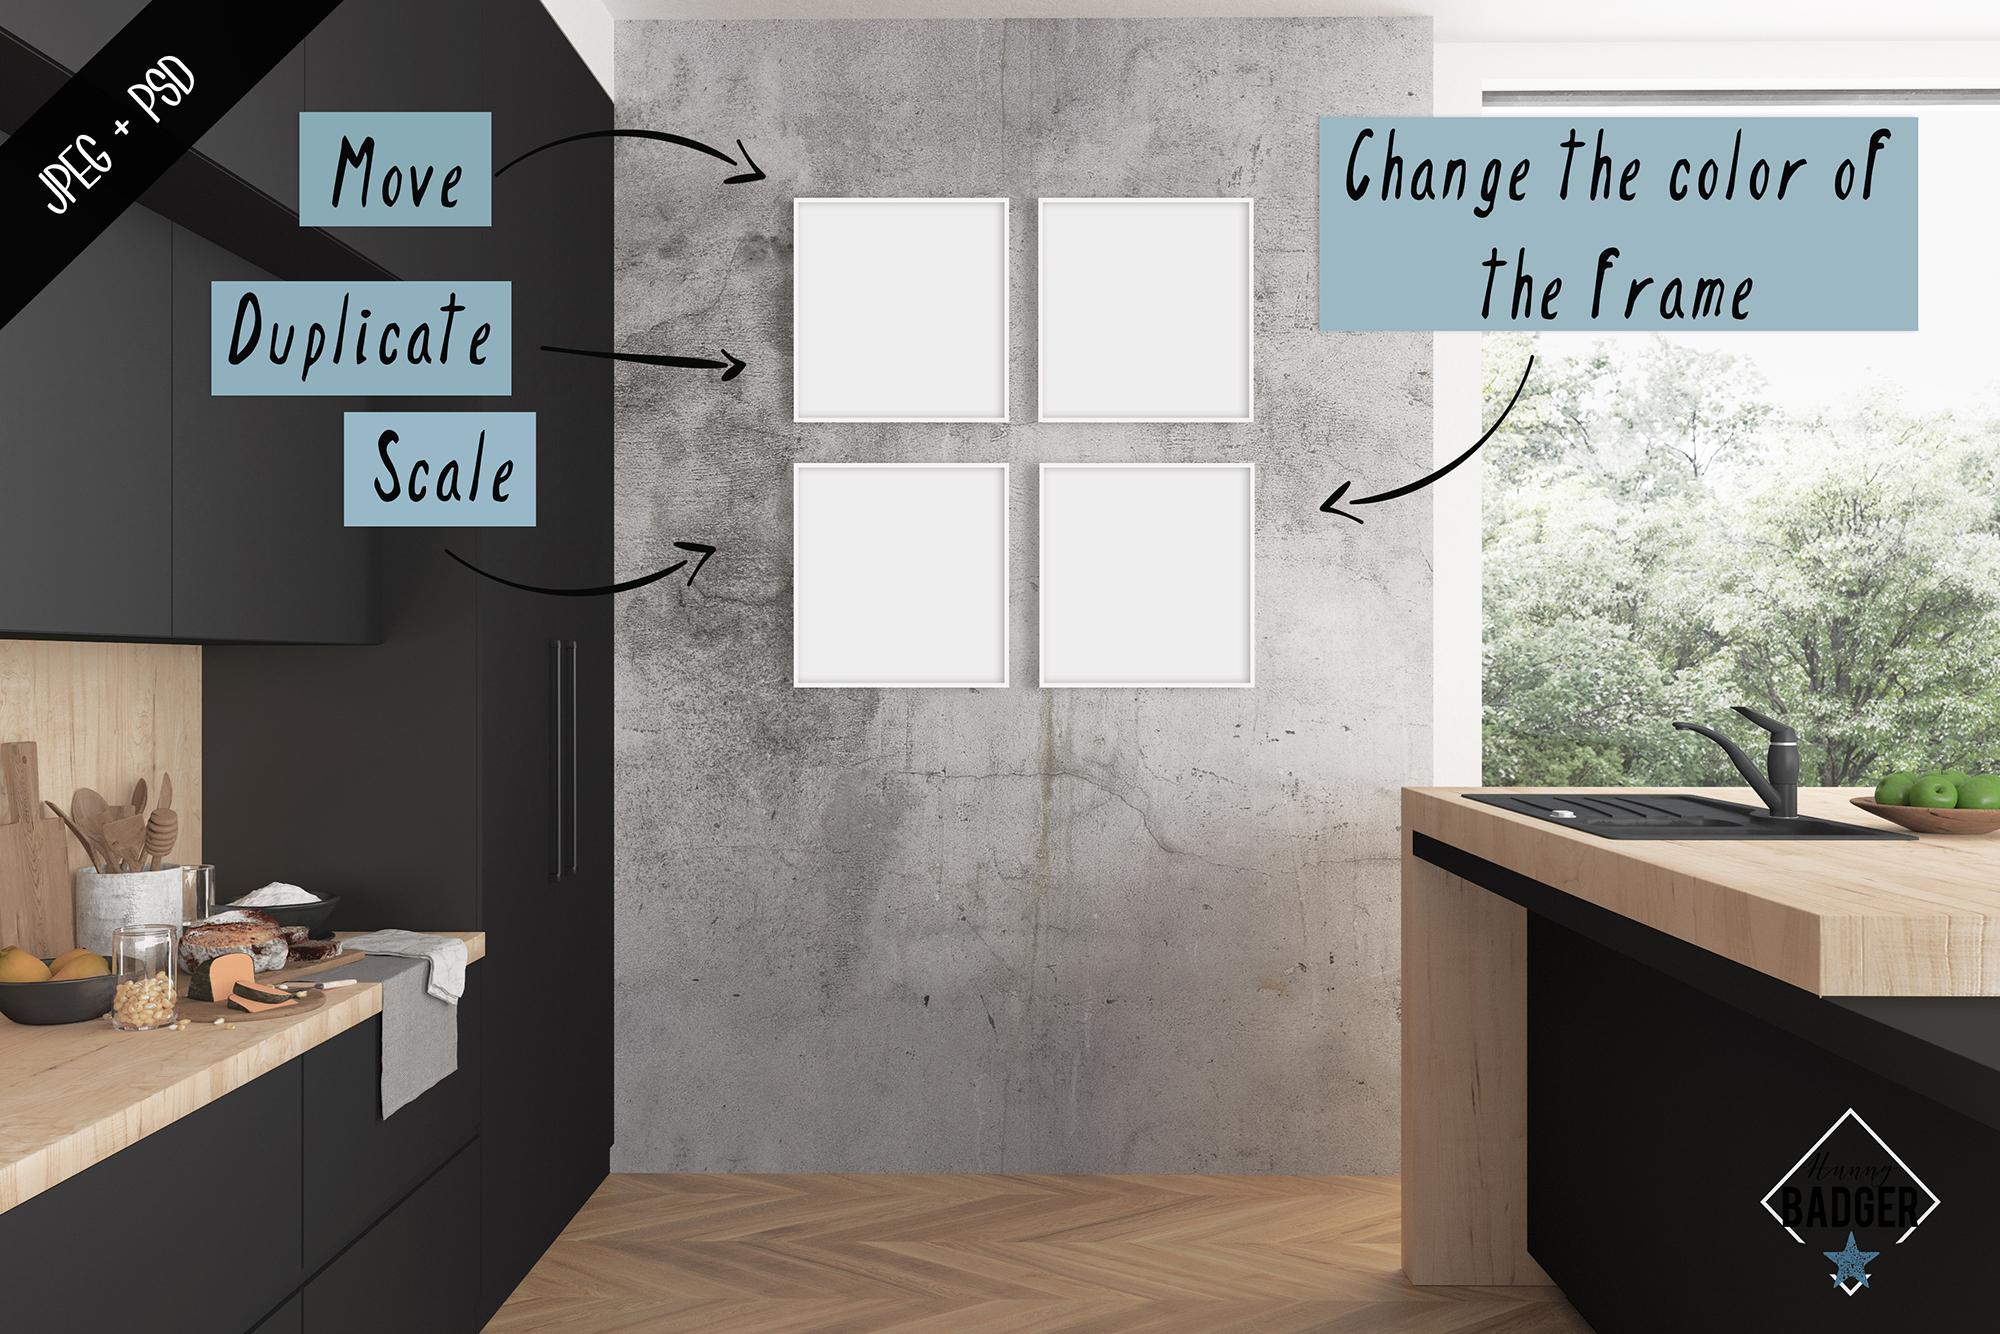 Interior mockup - frame & wall mockup creator example image 3